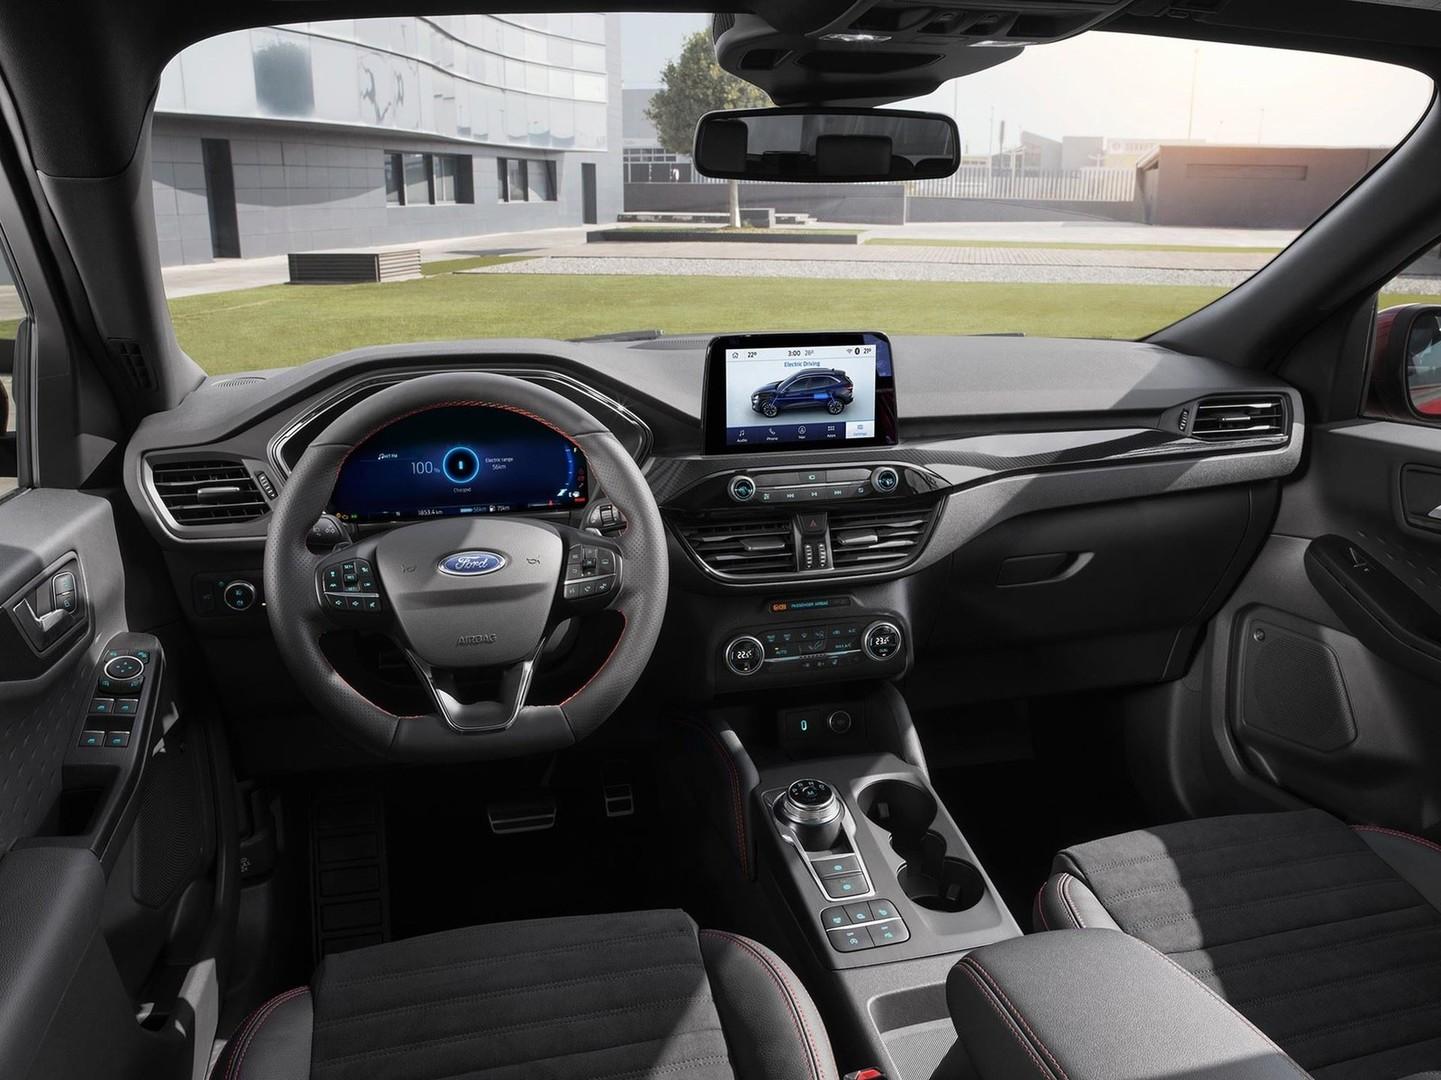 https://0501.nccdn.net/4_2/000/000/06b/a1b/2019_ford_kuga_cockpit-low_b.jpg